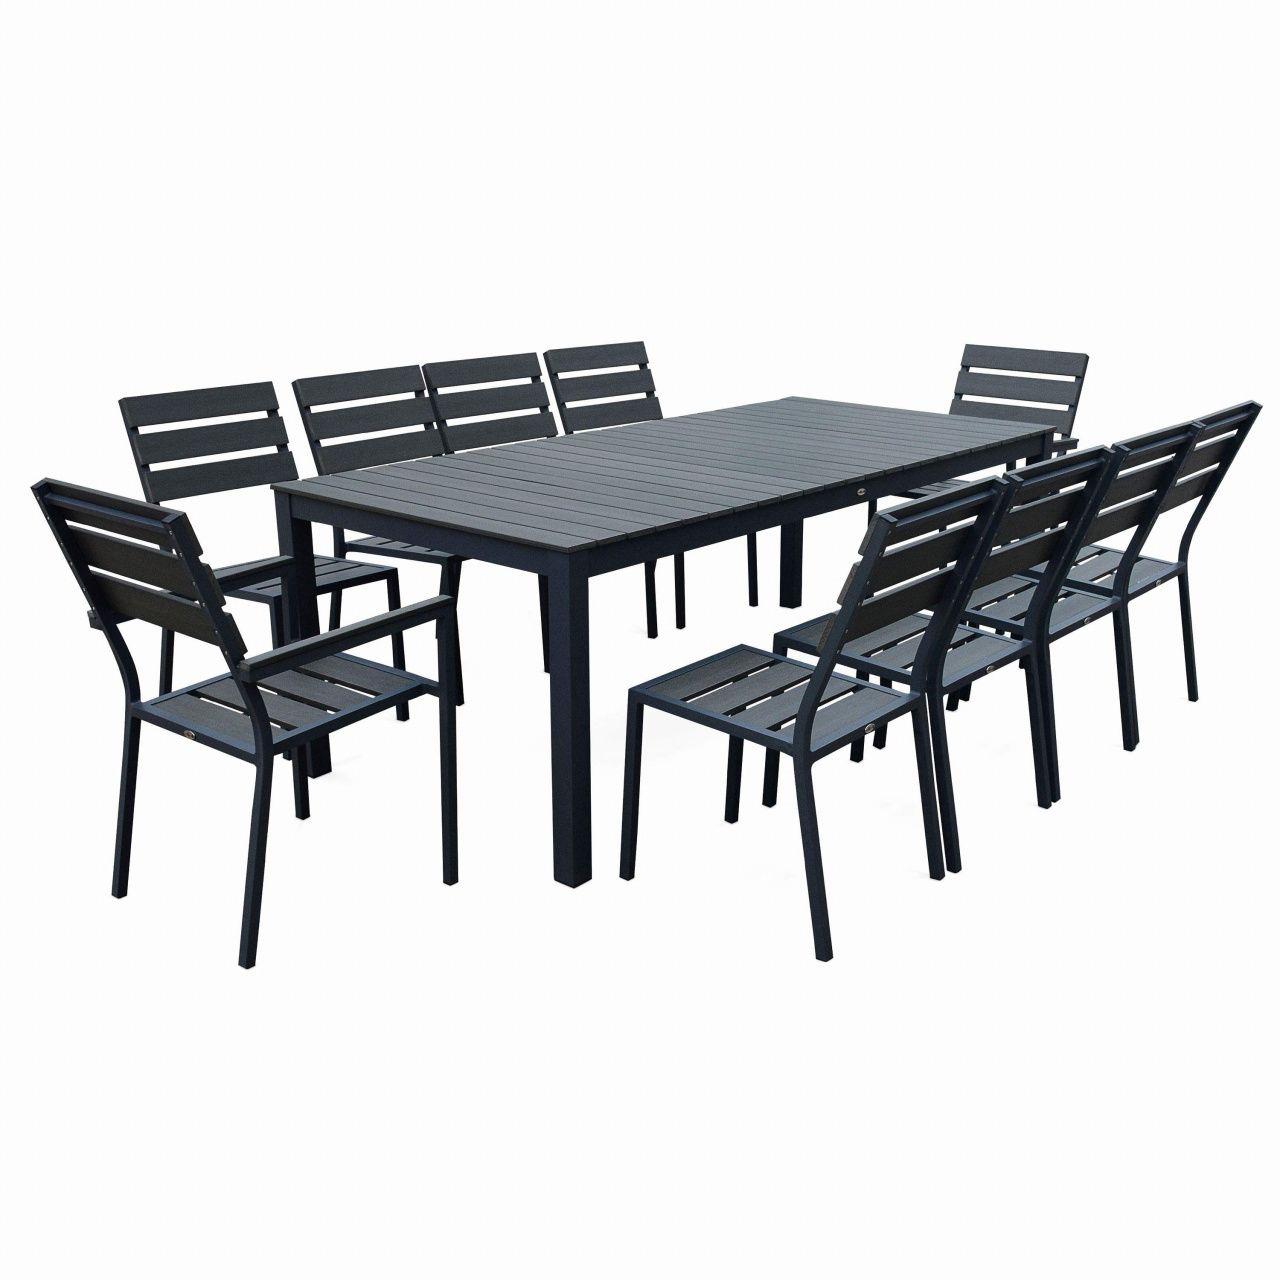 99 Fauteuil De Jardin Castorama | Outdoor Tables, Indoor Garden intérieur Table De Jardin En Alu